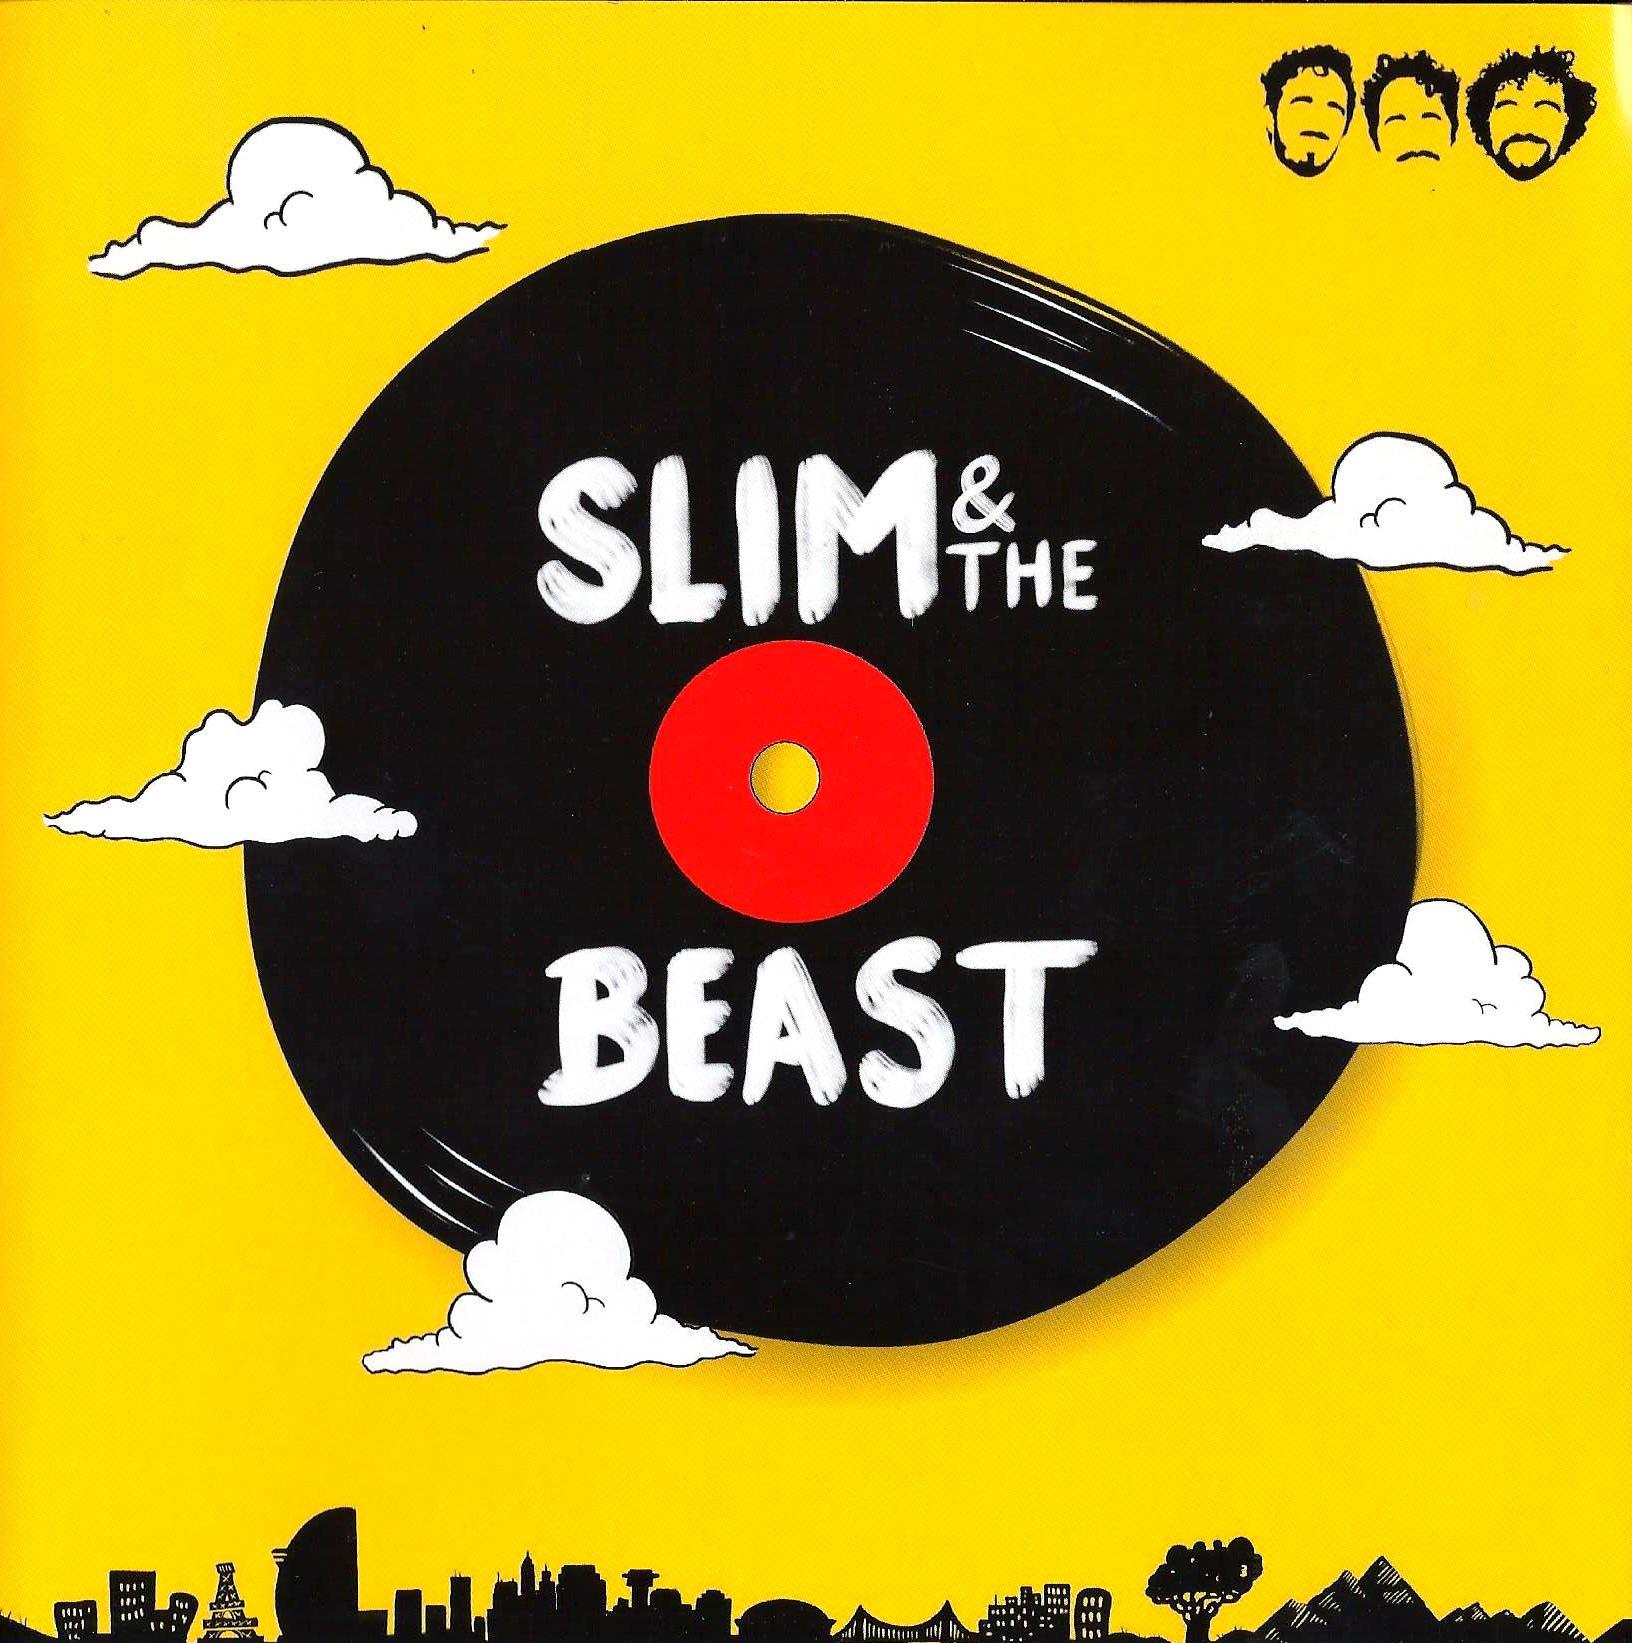 SLIM & THE BEAST - Slim & the Beast